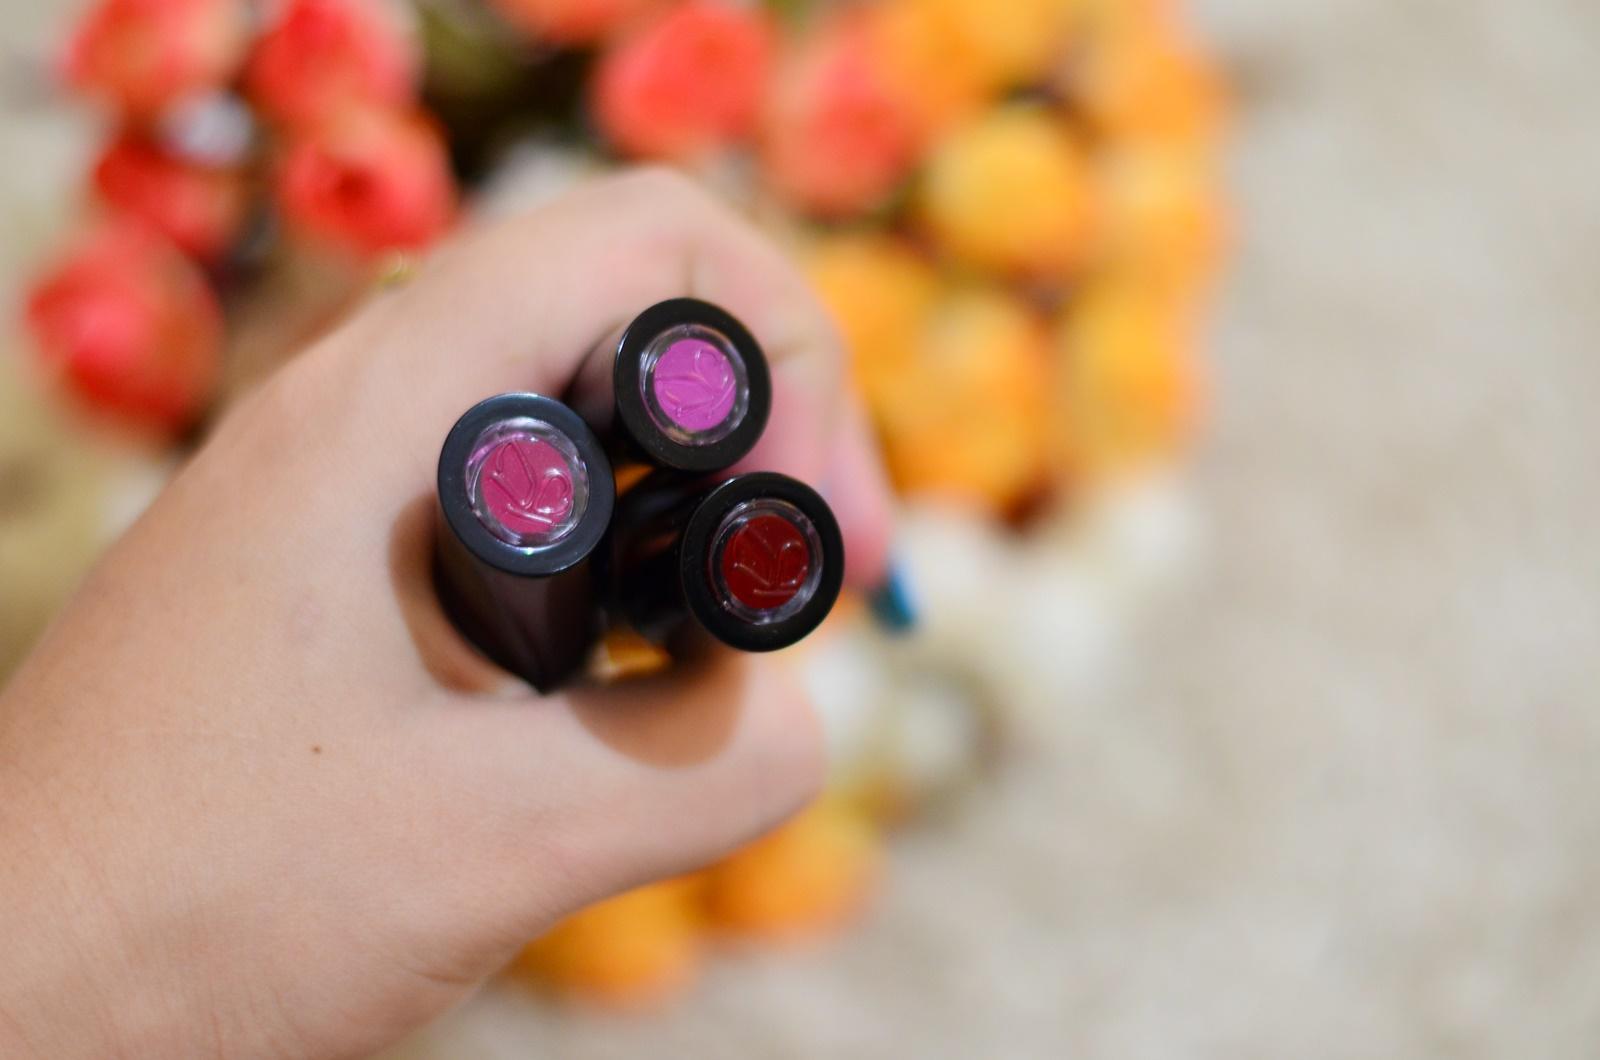 Maquiagens Inverno 2015 Vult Cosmética - batom cremoso - blog ursula pink woman